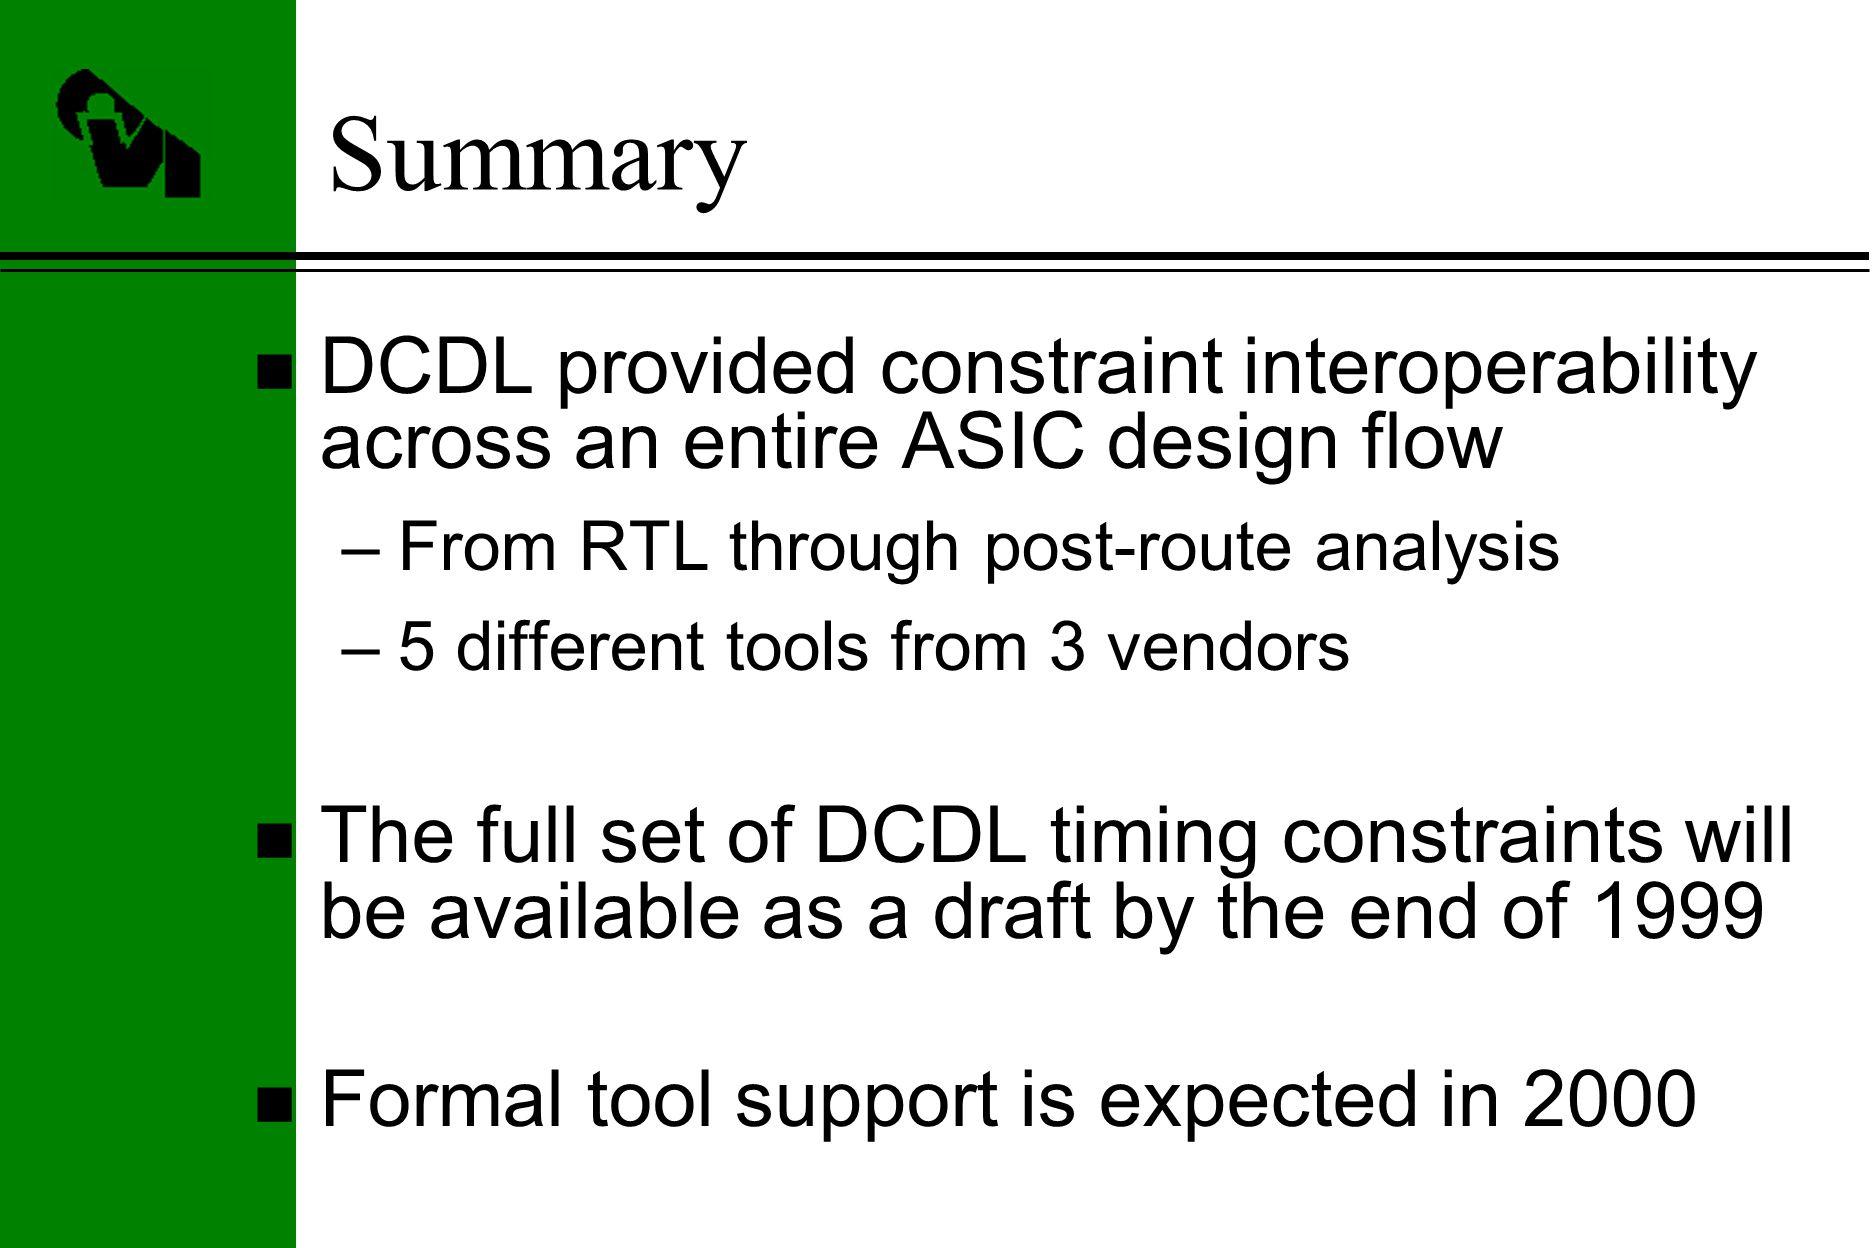 Dcdl The Design Constraints Description Language An Emerging Ovi Vlsi Flow 26 Summary N Provided Constraint Interoperability Across Entire Asic